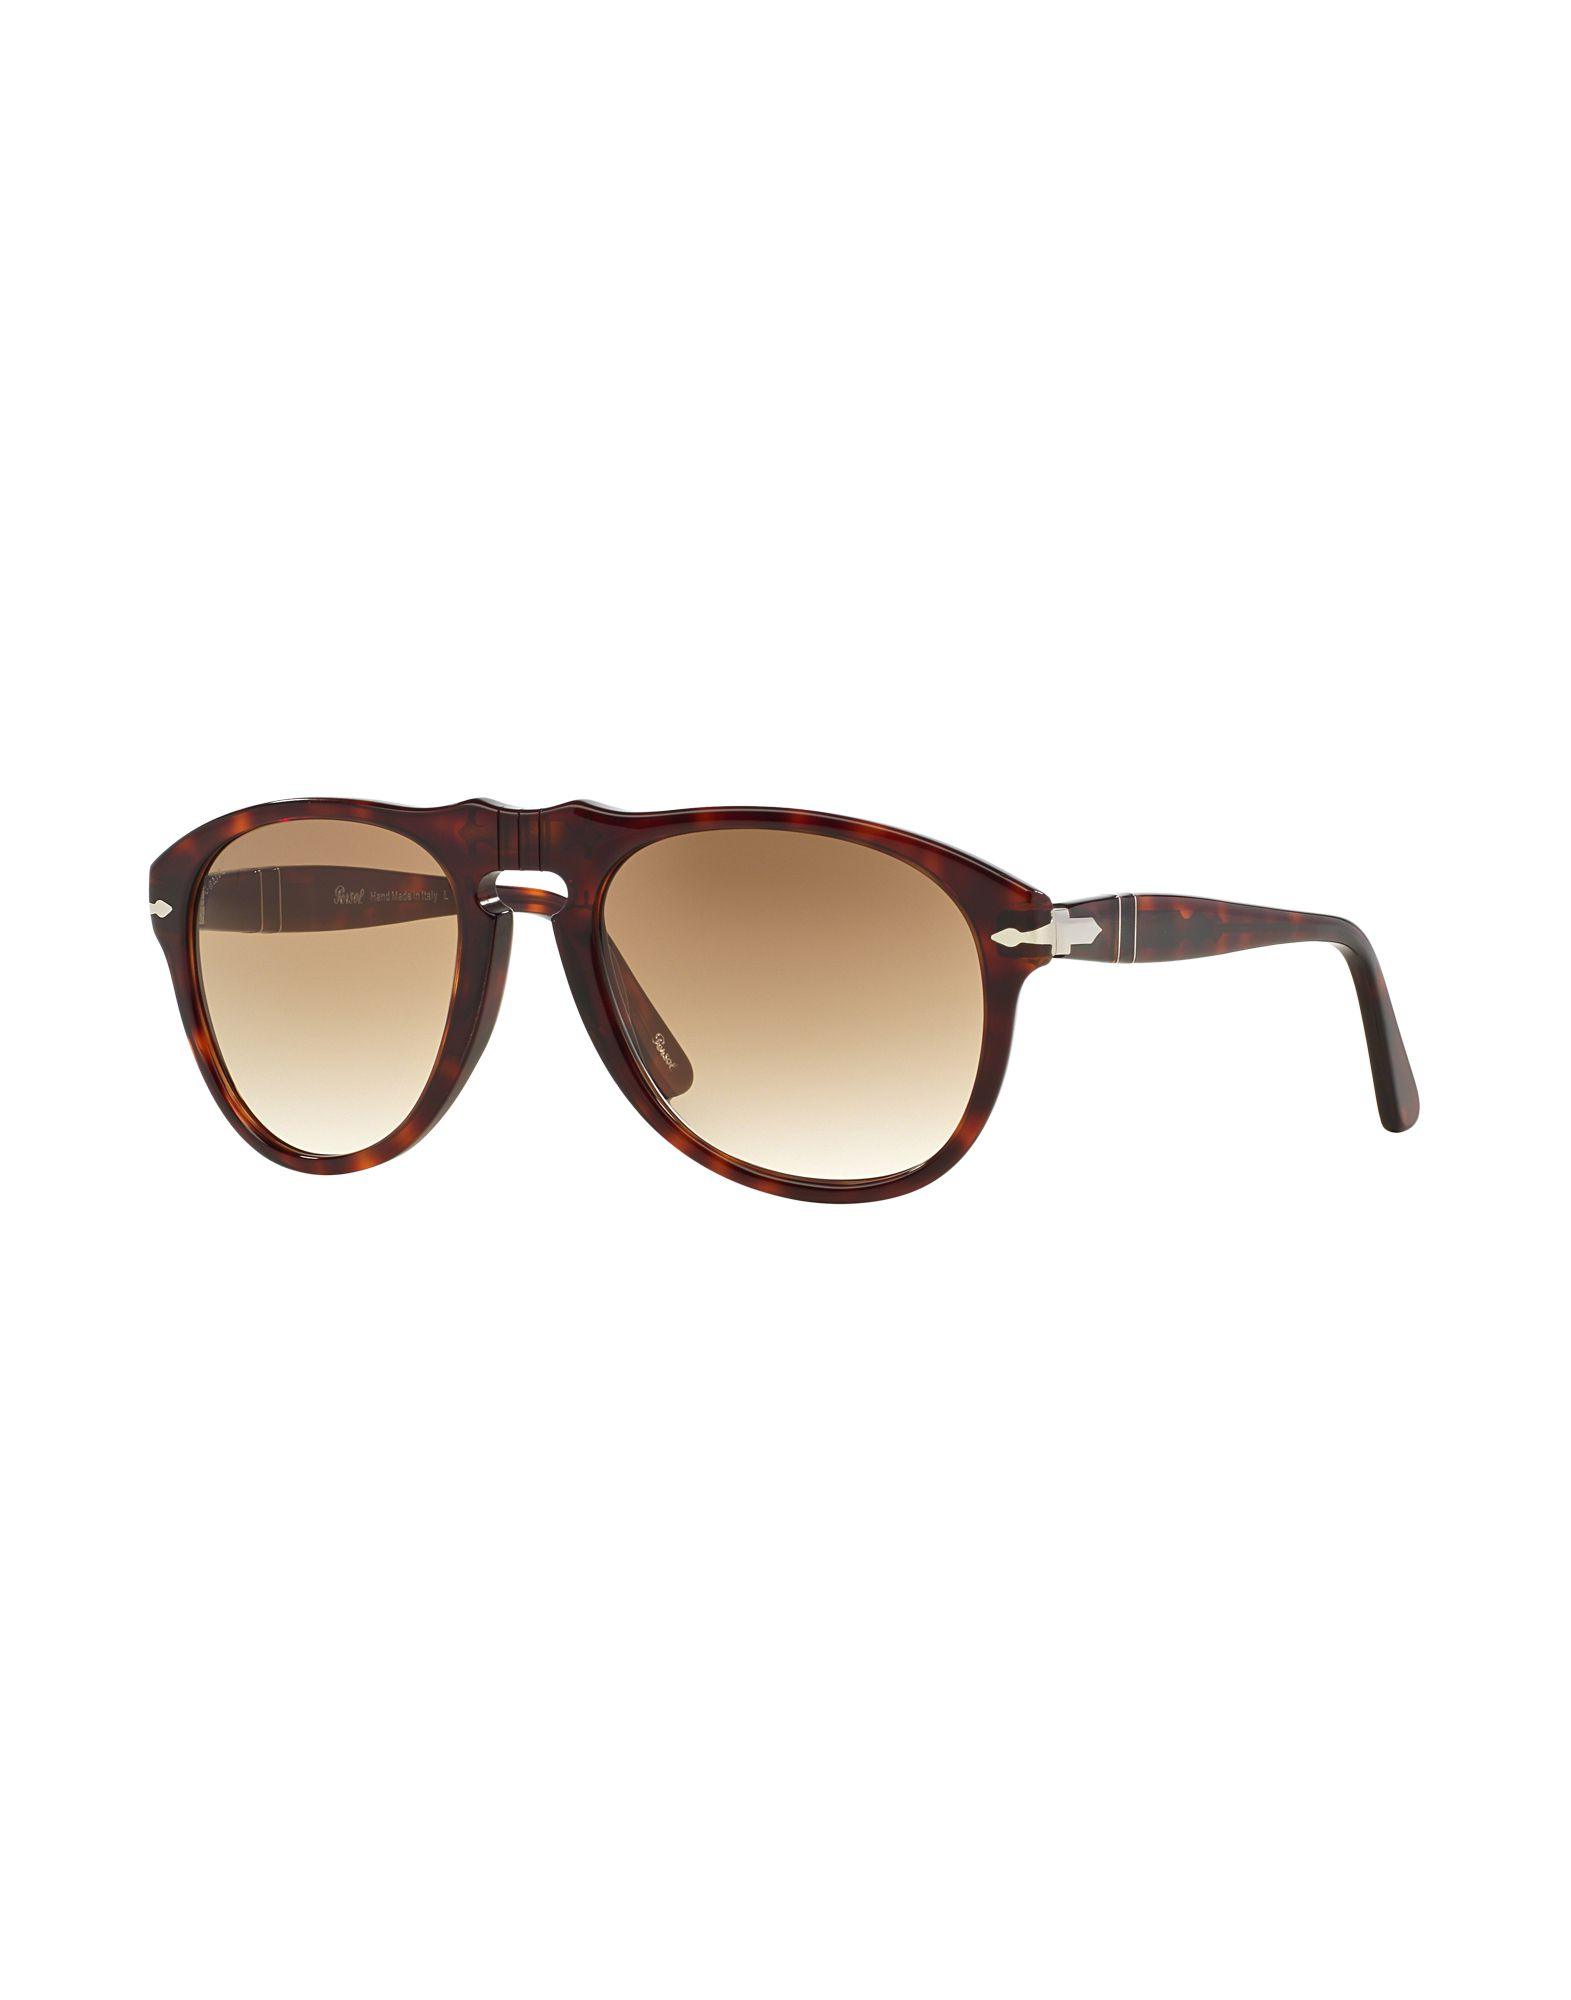 dd94d2f428 Persol Po0649 - Sunglasses - Women Persol Sunglasses online on YOOX ...